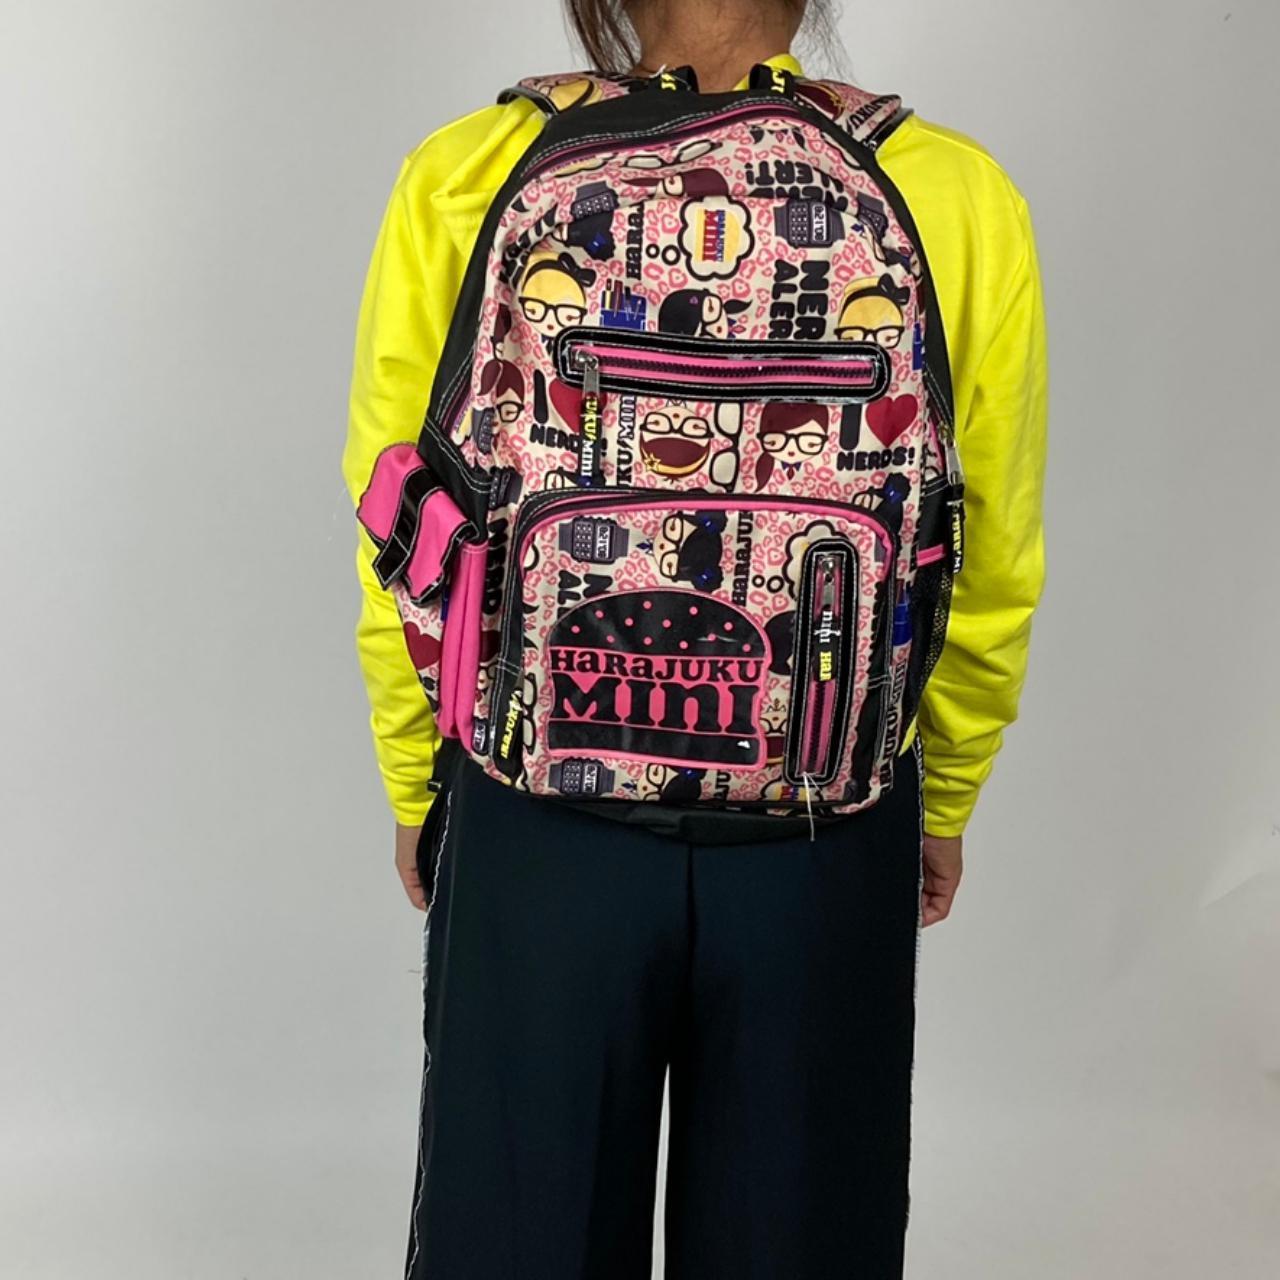 Product Image 1 - Harajuku Mini Backpack A little worn